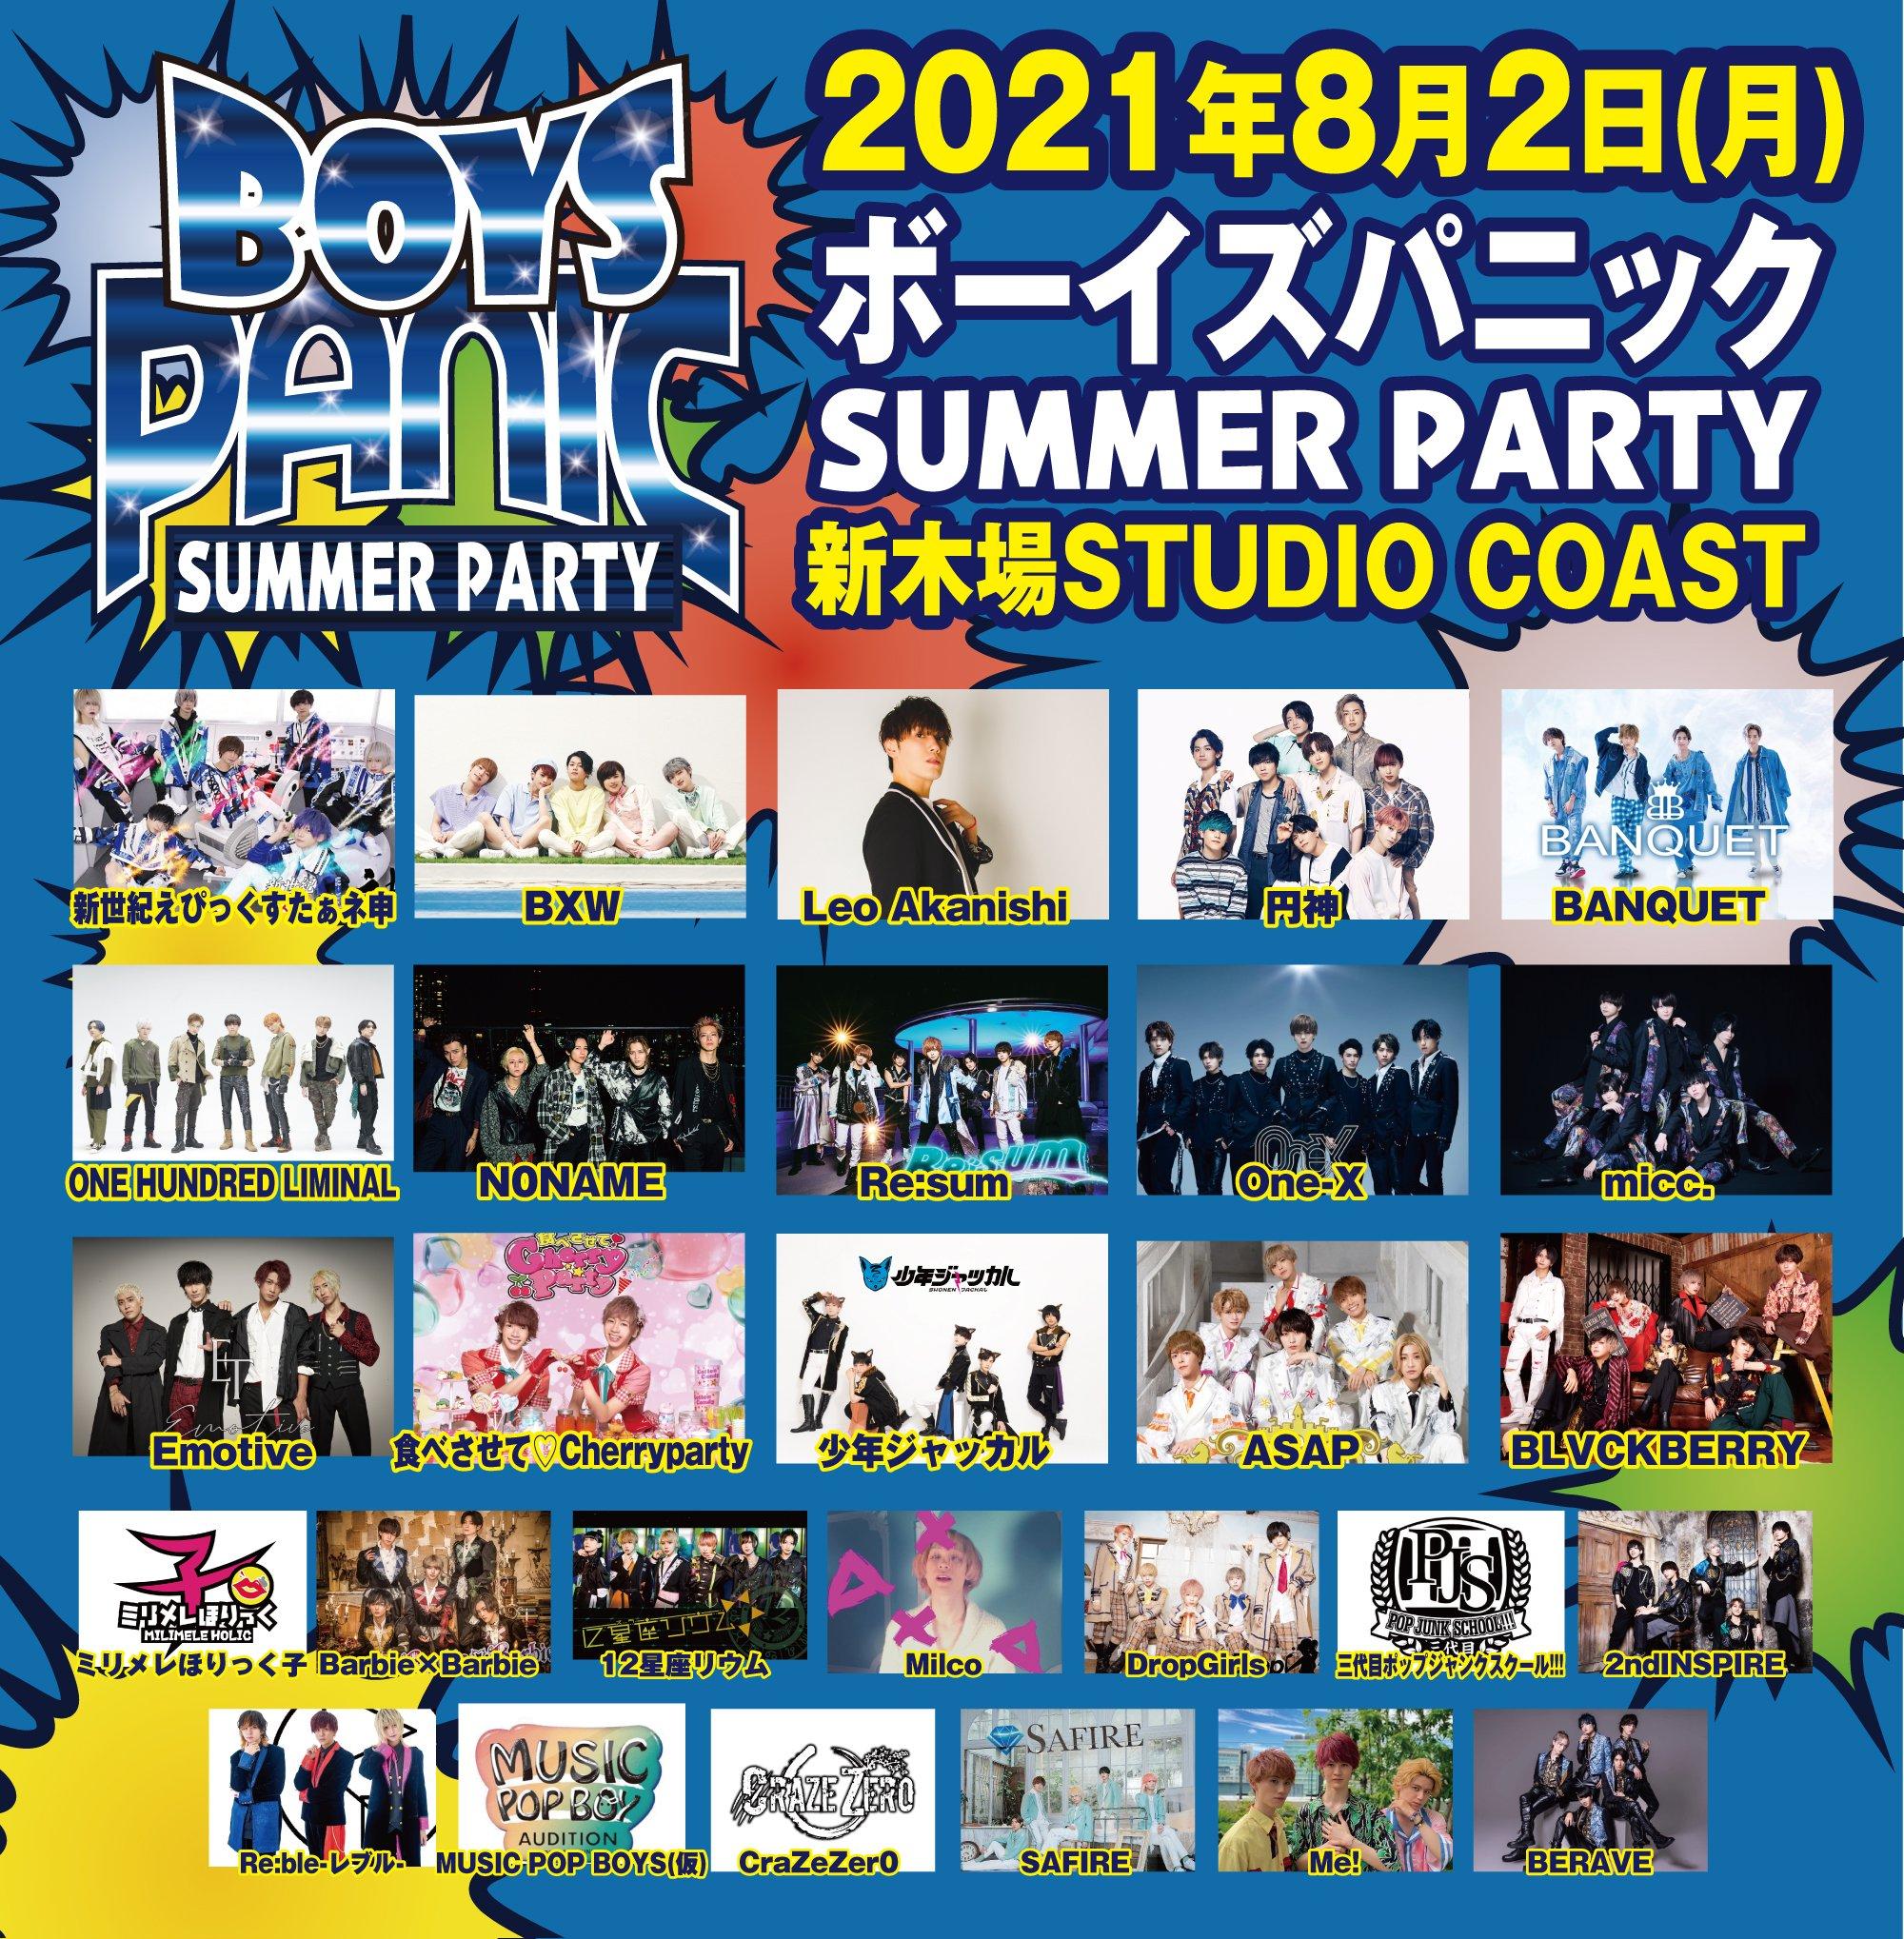 『BOYS PANIC 2021〜SUMMER PARTY〜』